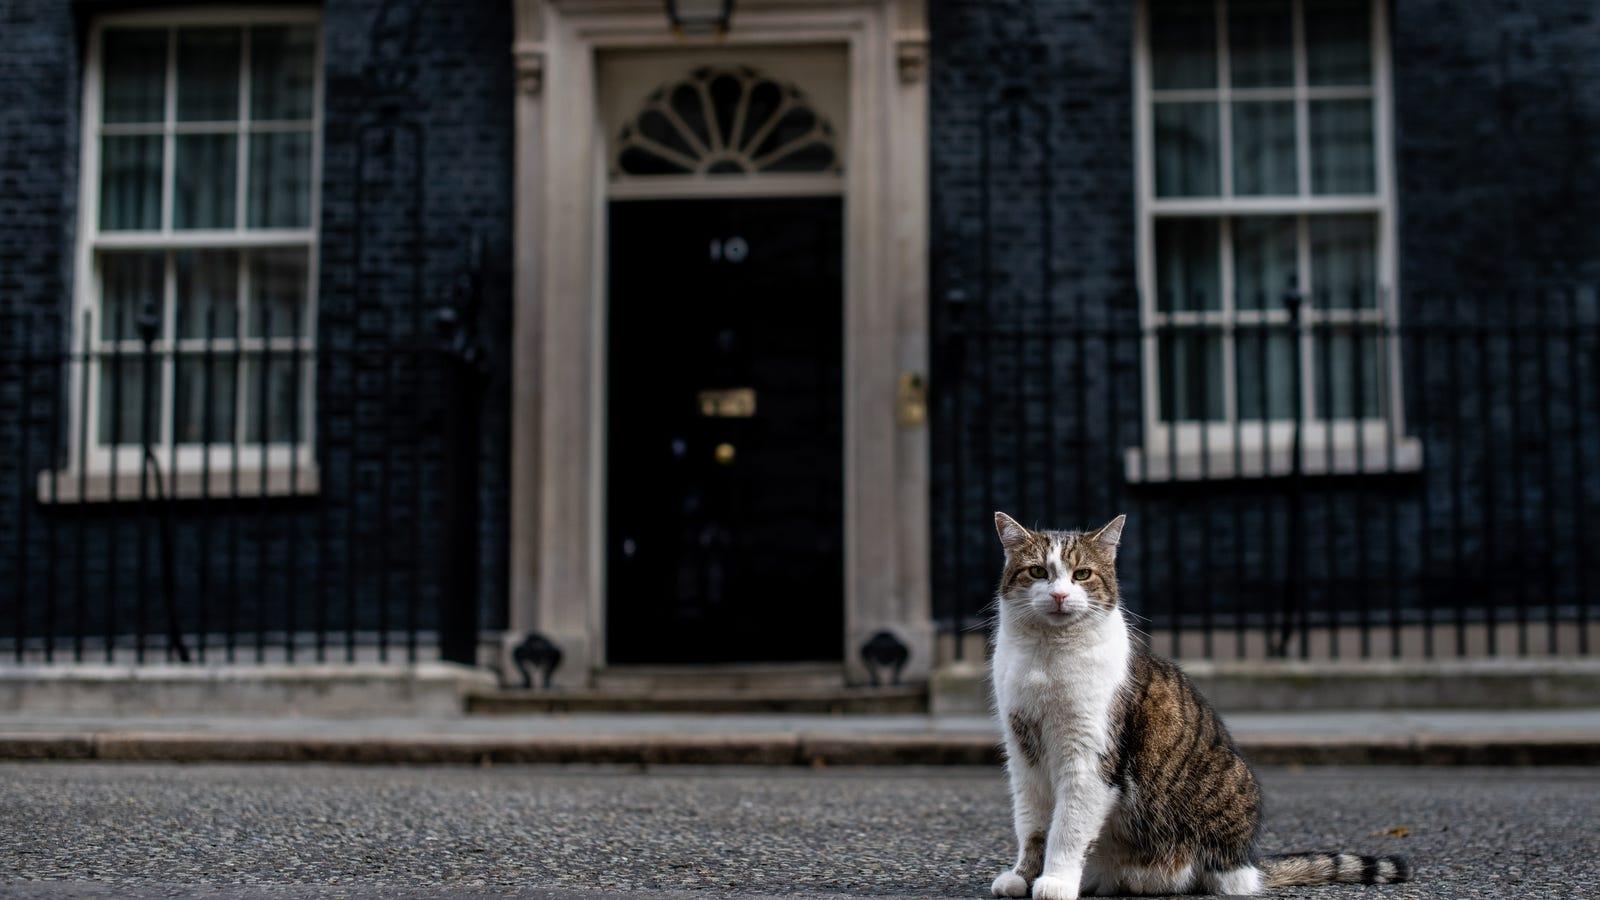 Make the Cat Prime Minister